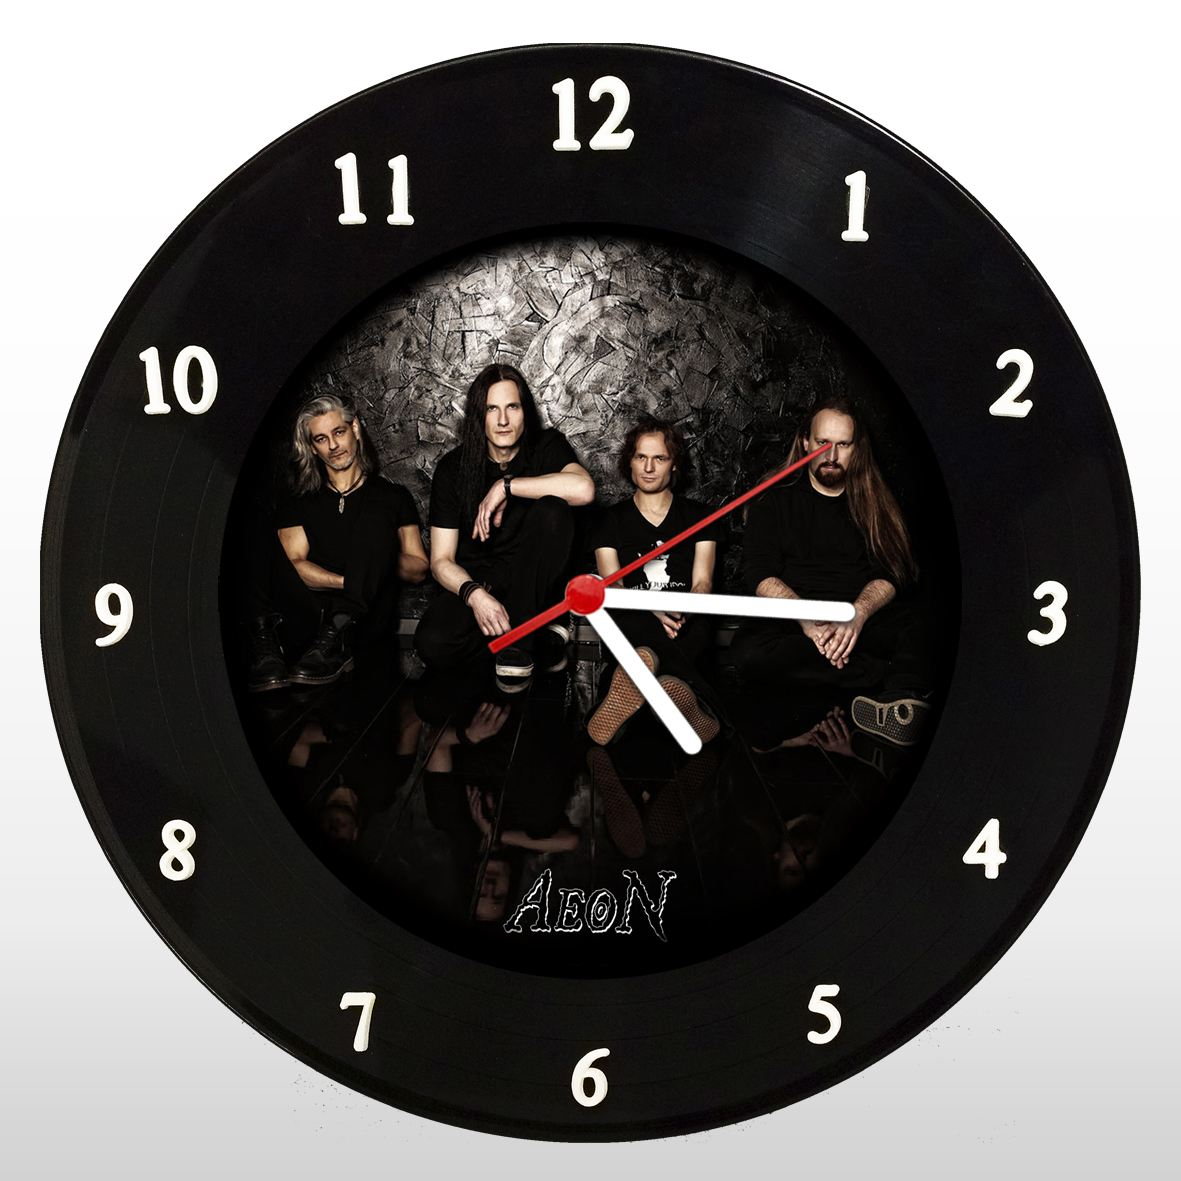 Aeon - Relógio de Parede em Disco de Vinil - Mr. Rock